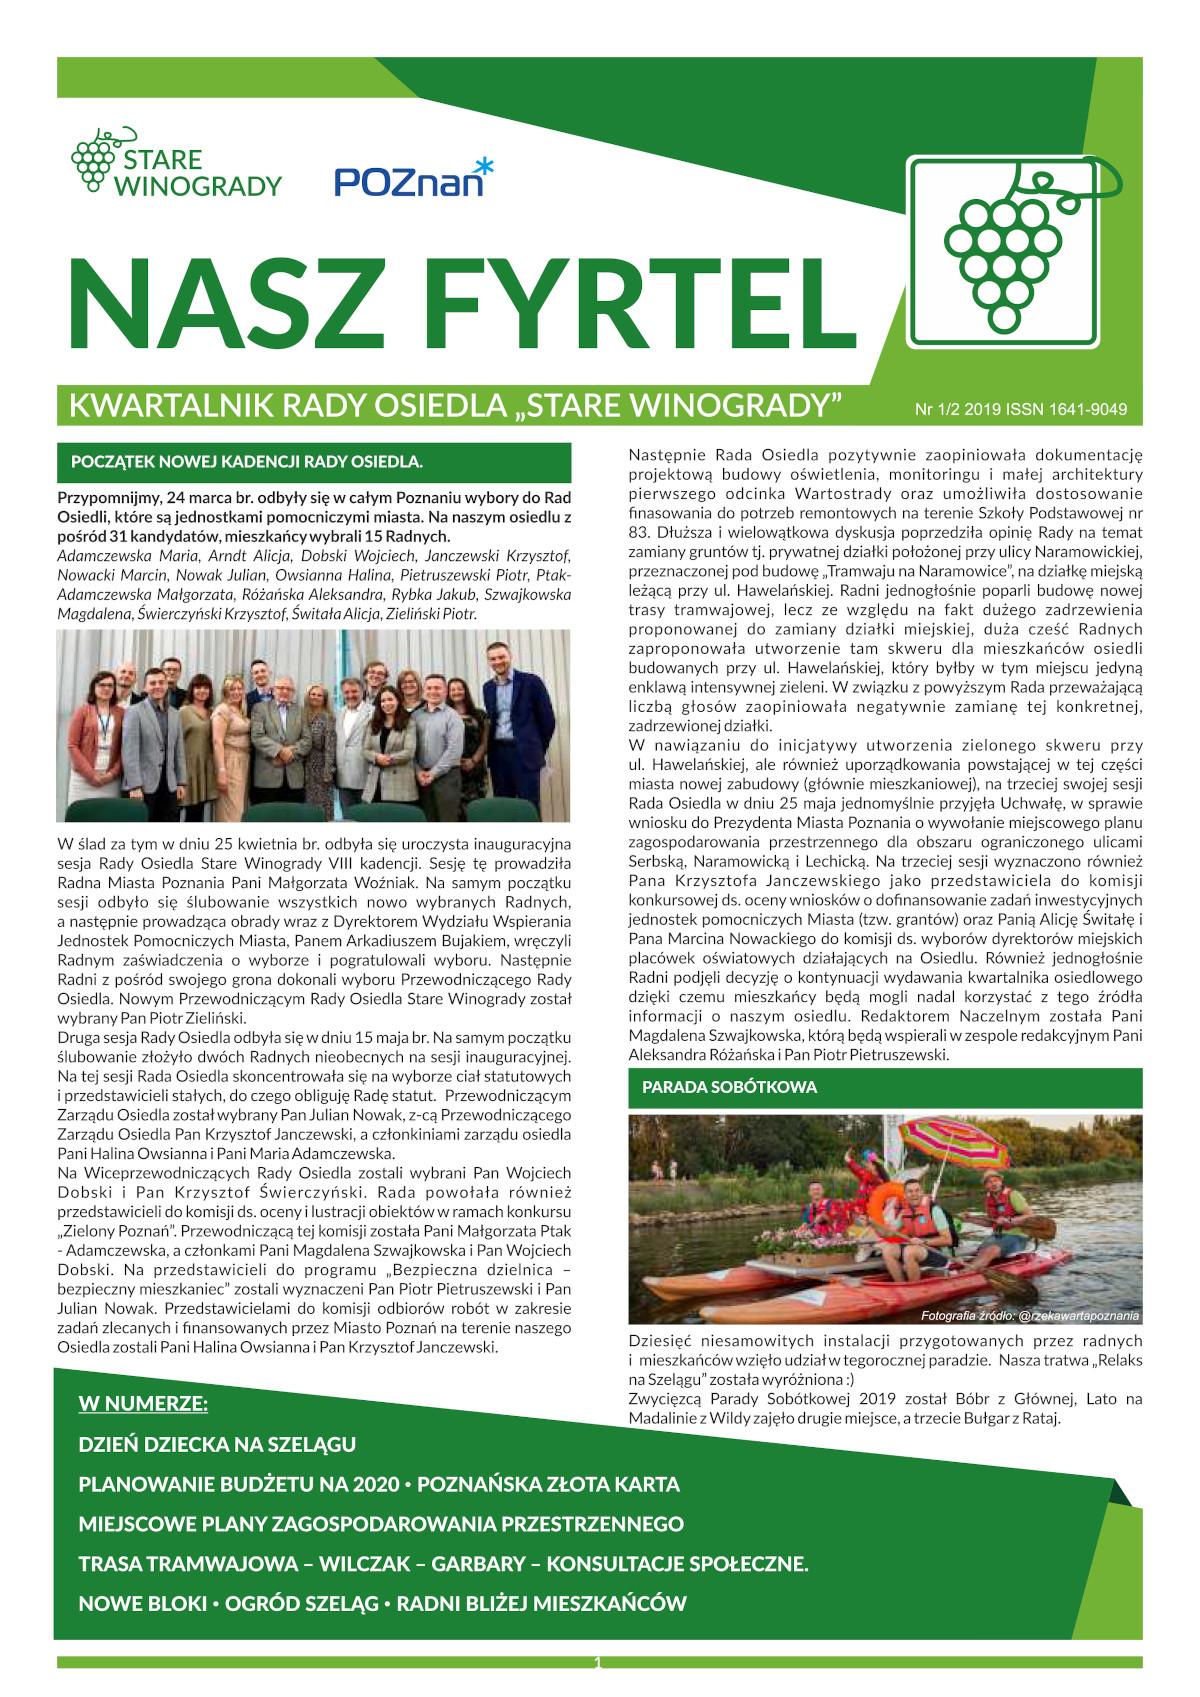 Nasz Fyrtel